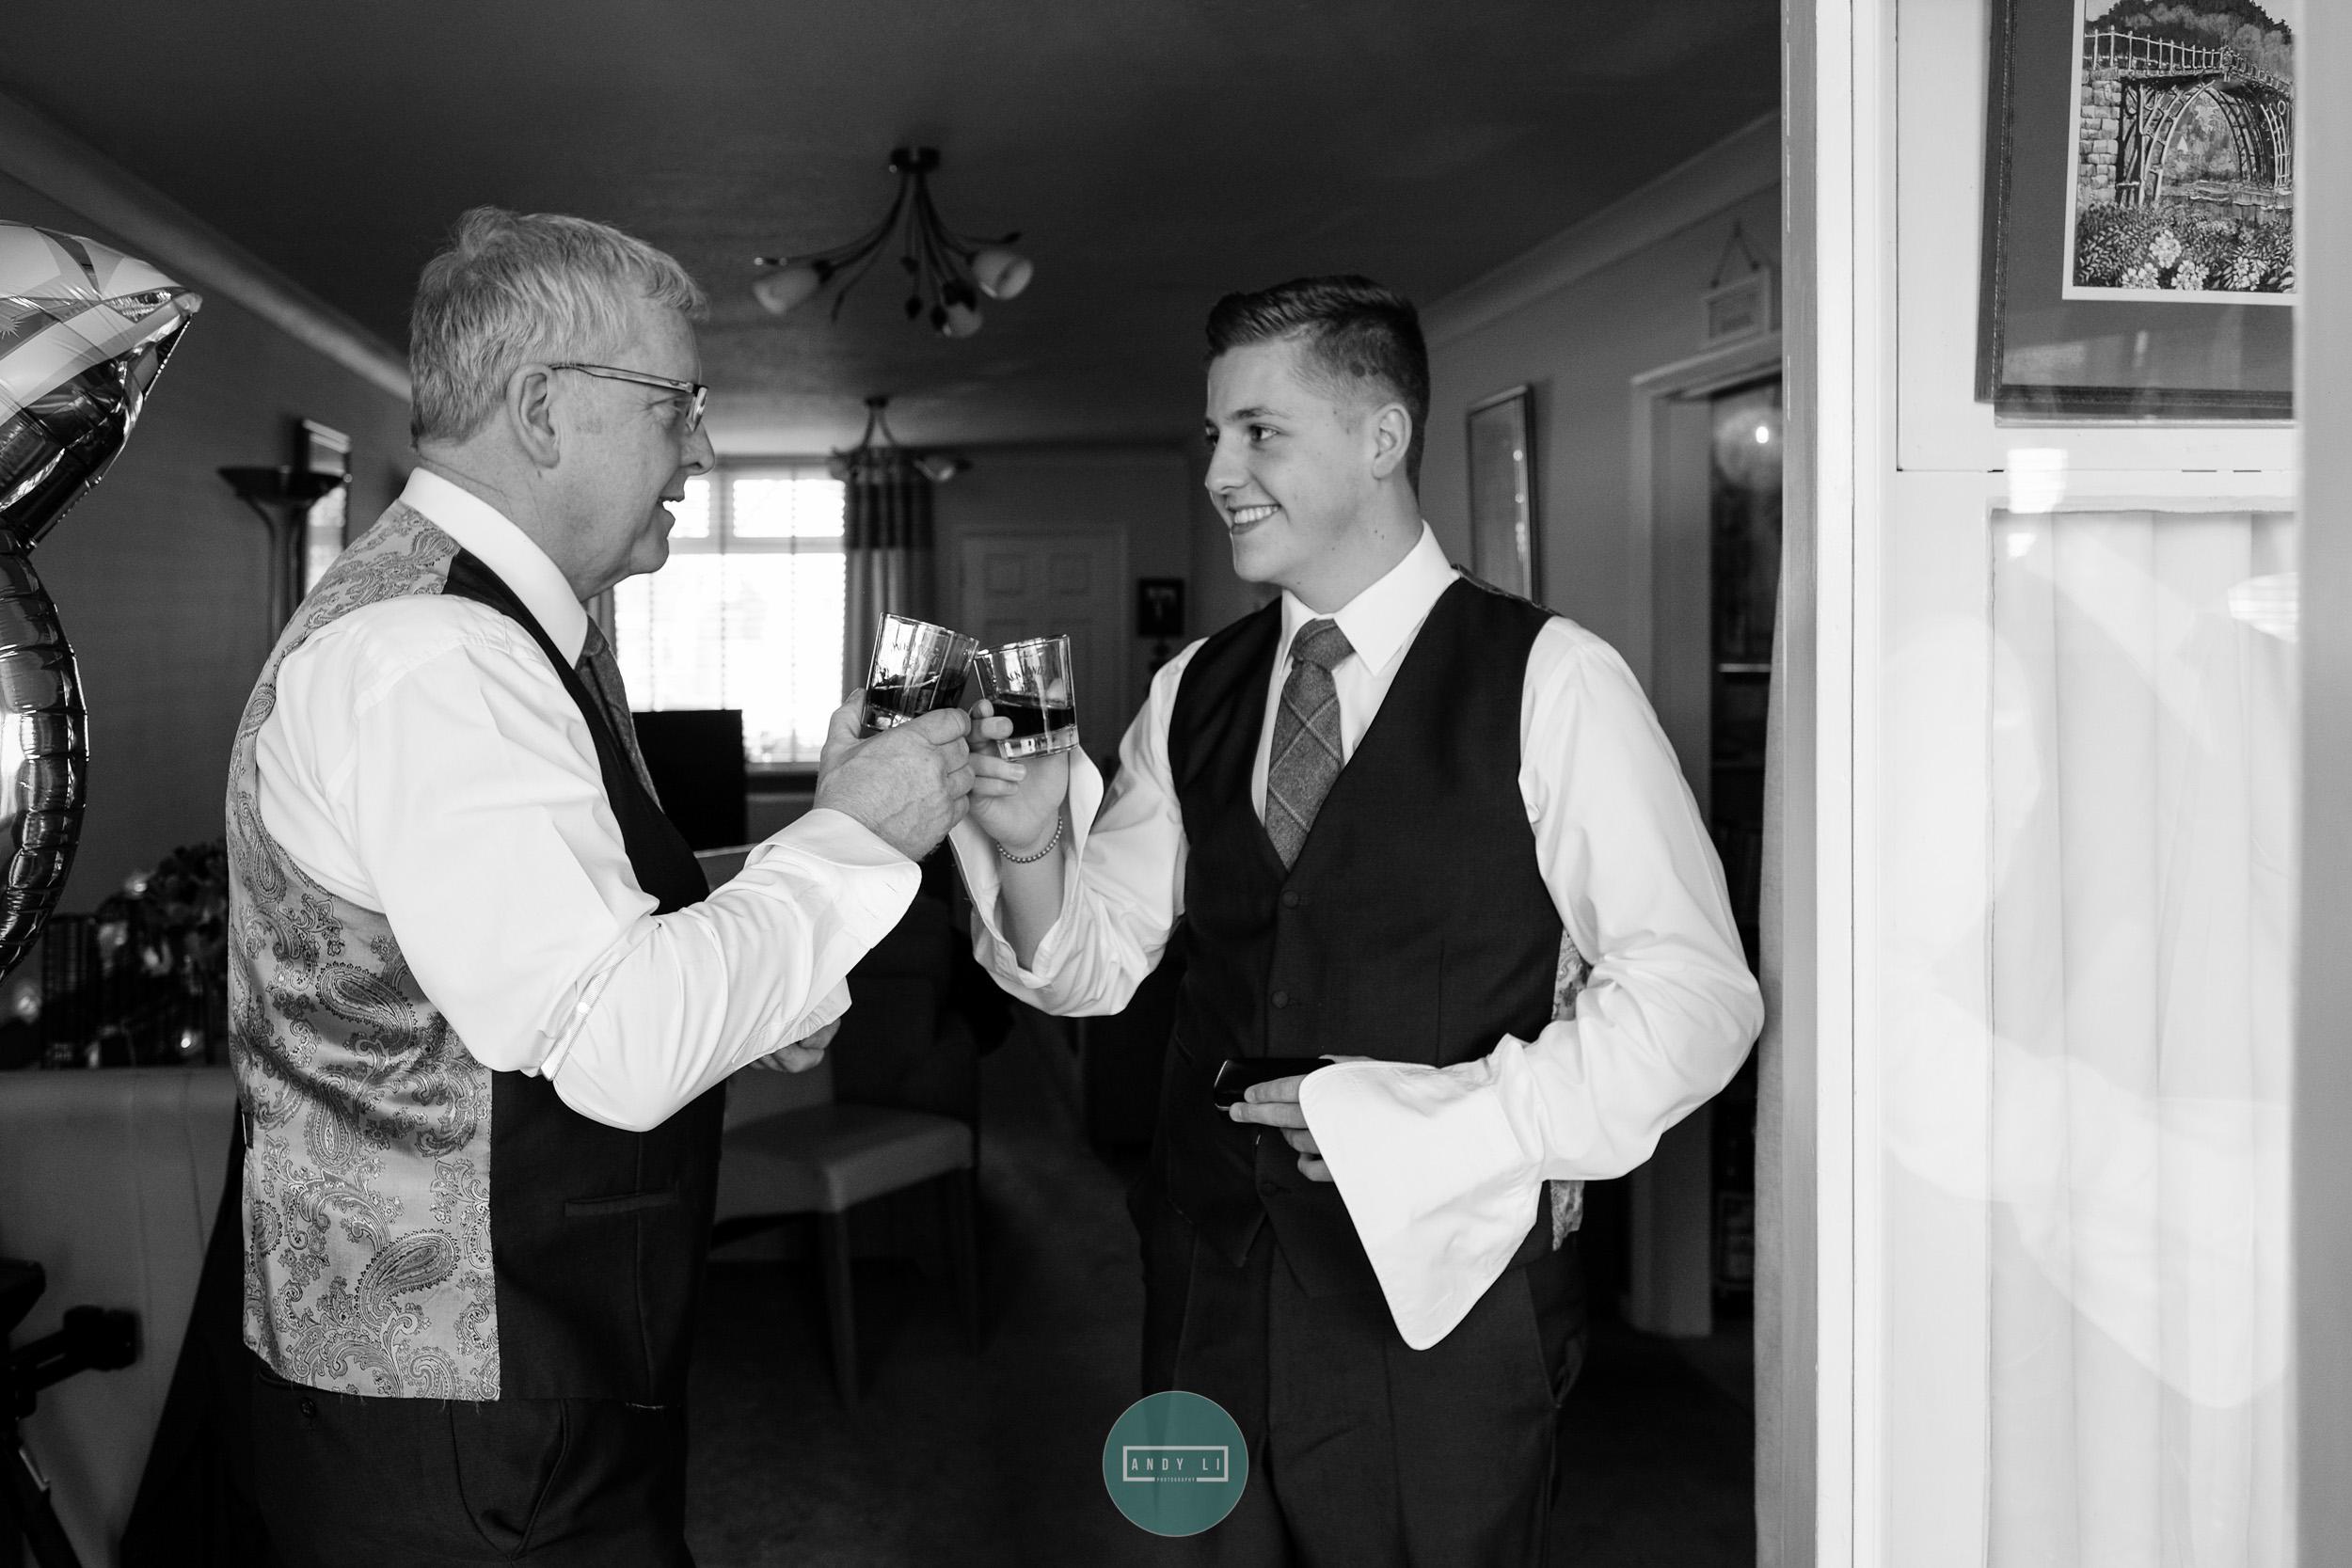 Lilleshall Hall Wedding Photographer-009-XPRO0437.jpg